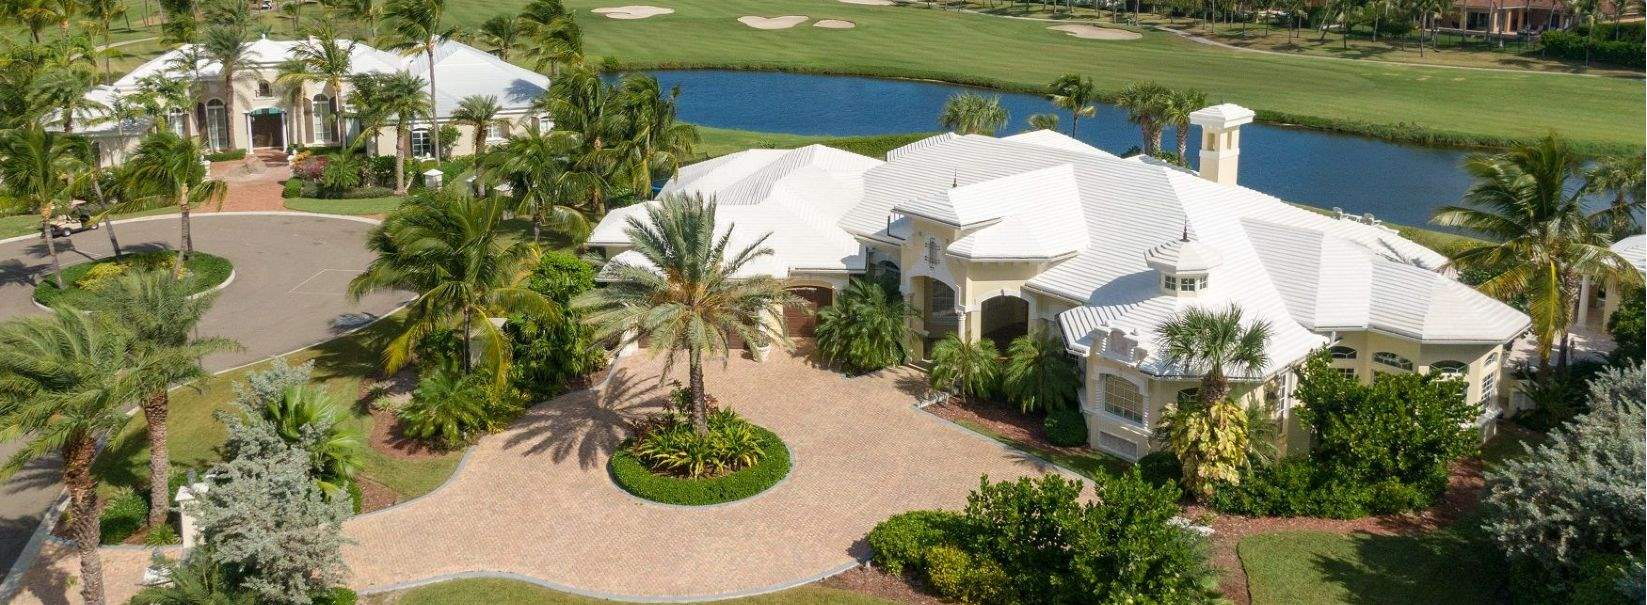 Four Seasons House, Ocean Club Estates, Paradise Island, Bahamas